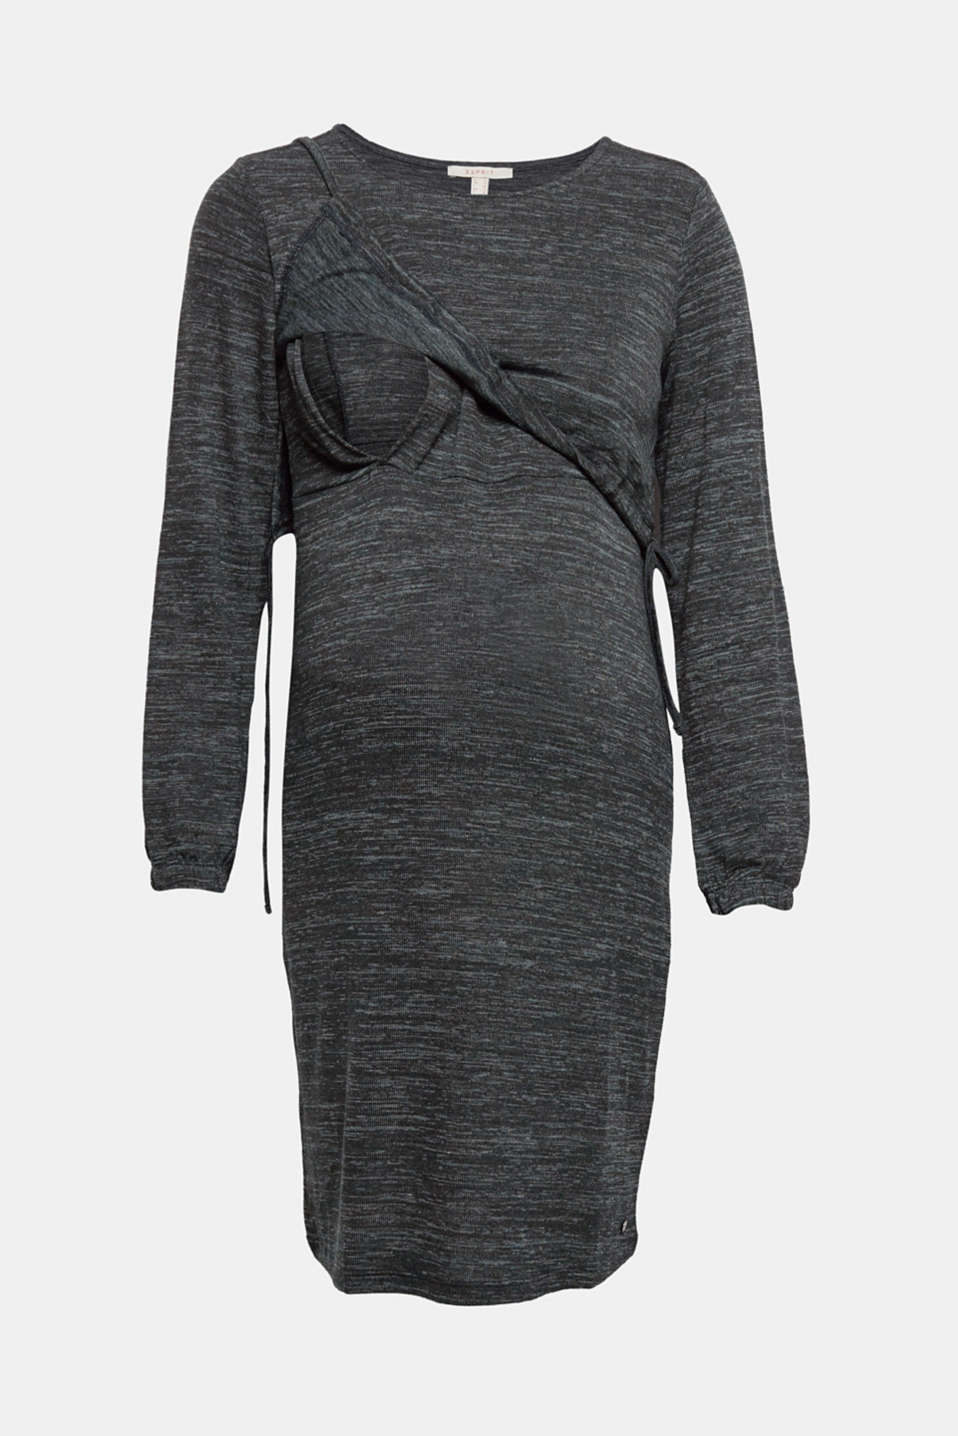 Dresses knitted, LCNAVY, detail image number 5